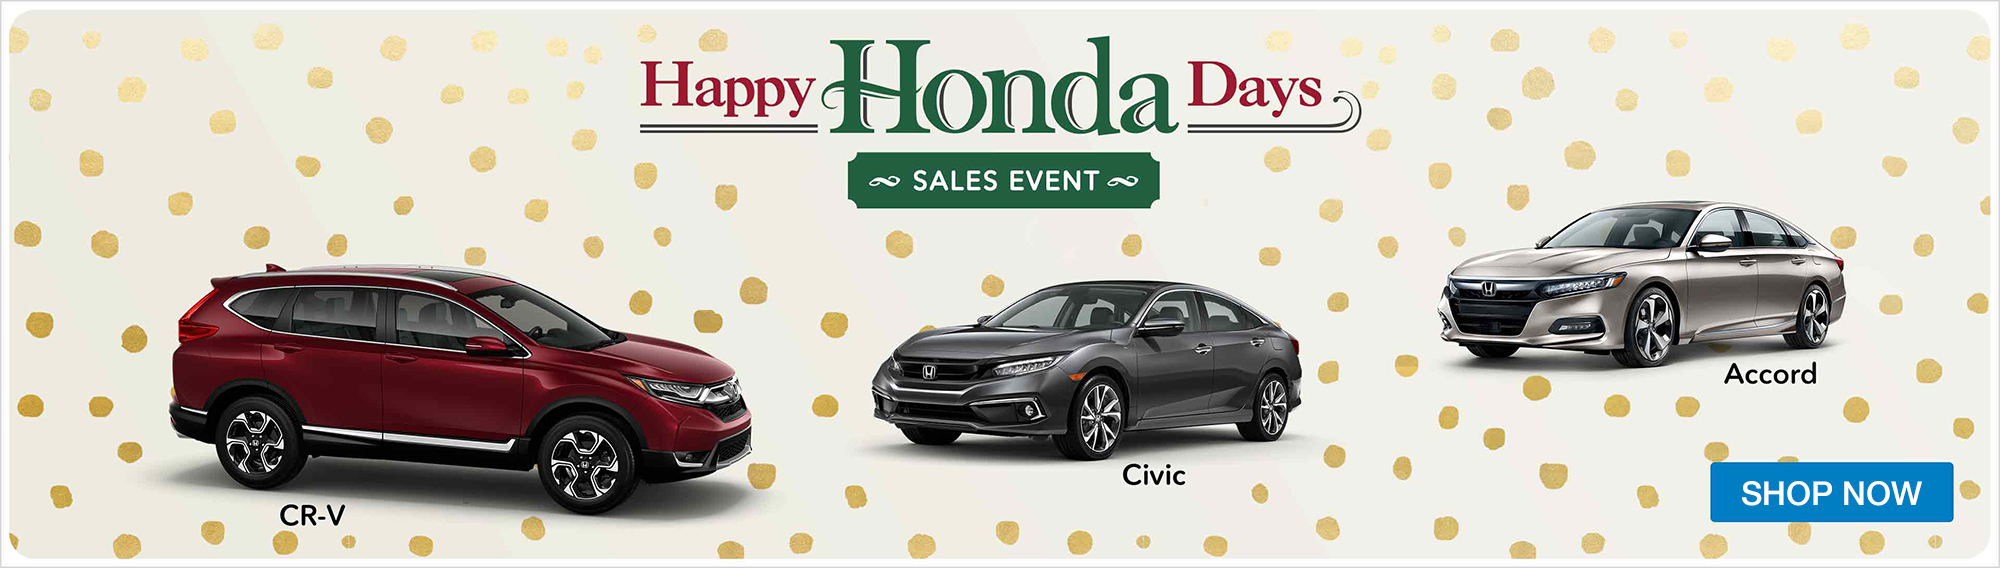 Happy Honda Days Sales Event at Honda World Westminster 2019